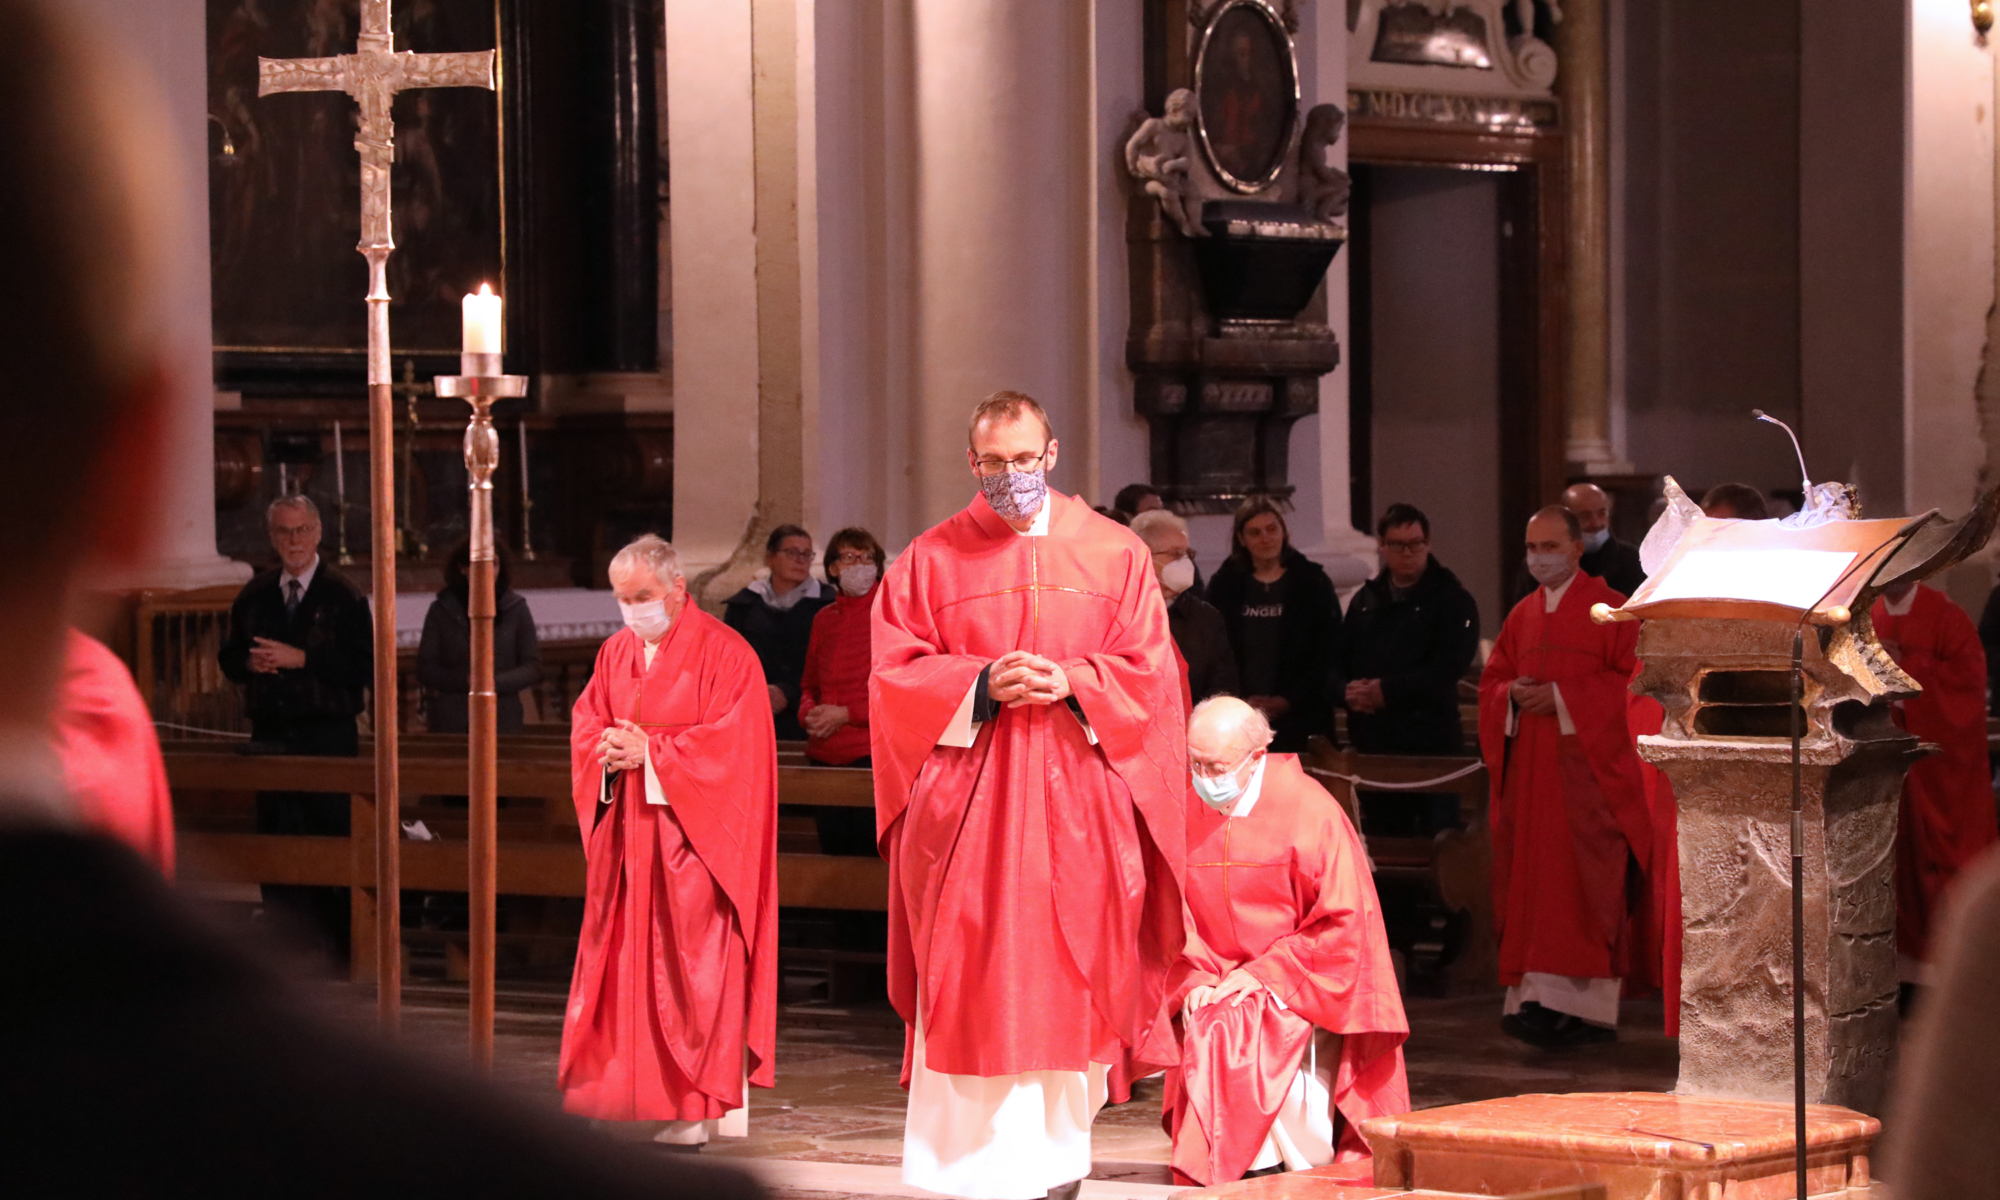 20201012 Pontifikalamt Maximilian1